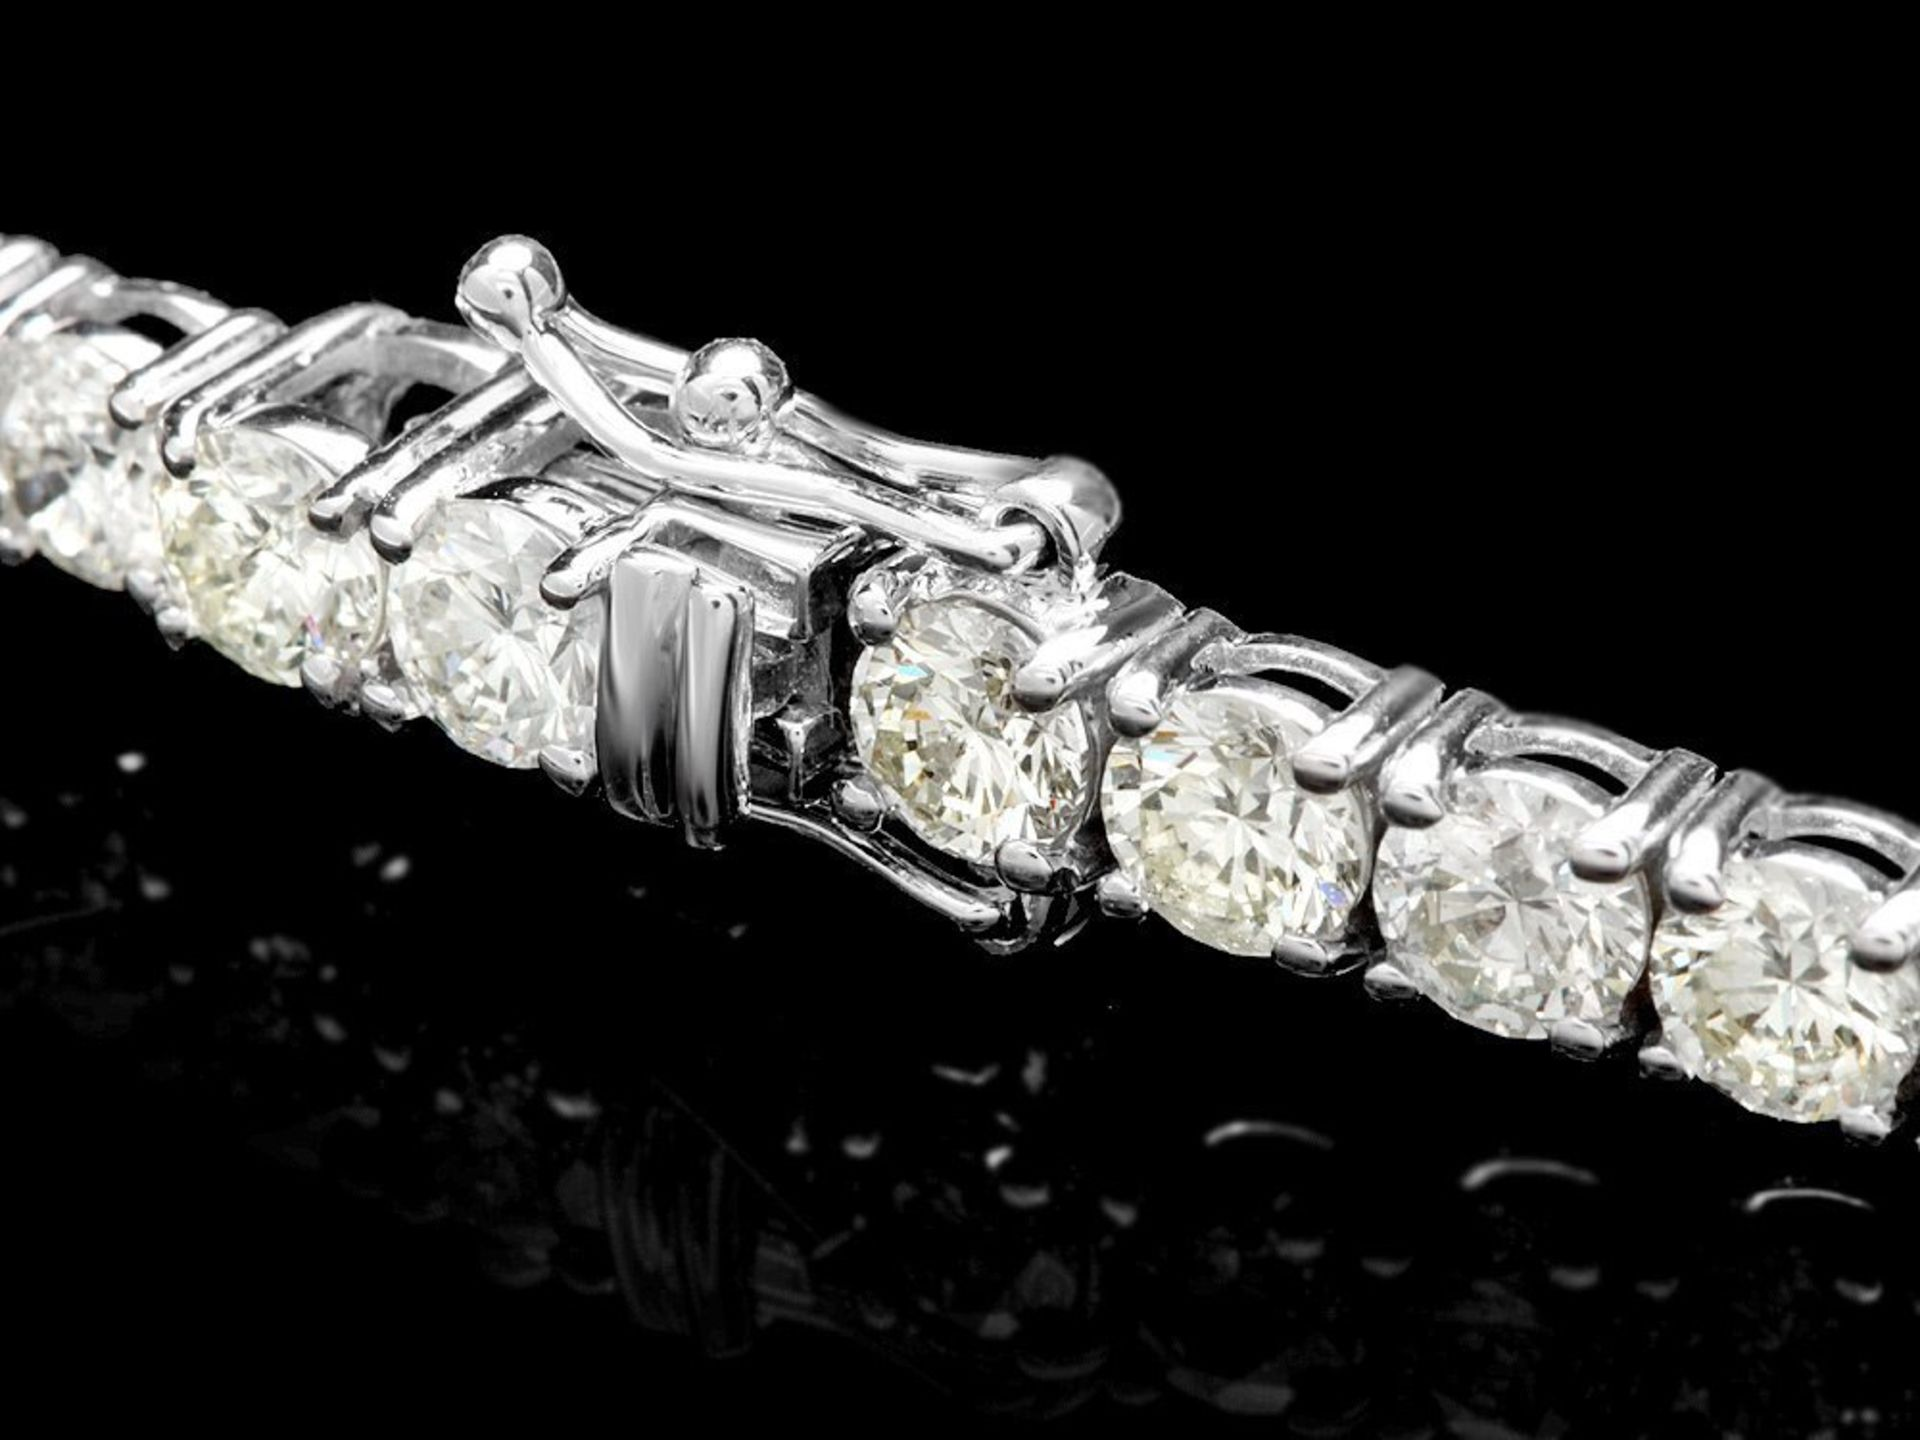 18k White Gold 12.00ct Diamond Tennis Bracelet - Image 2 of 4